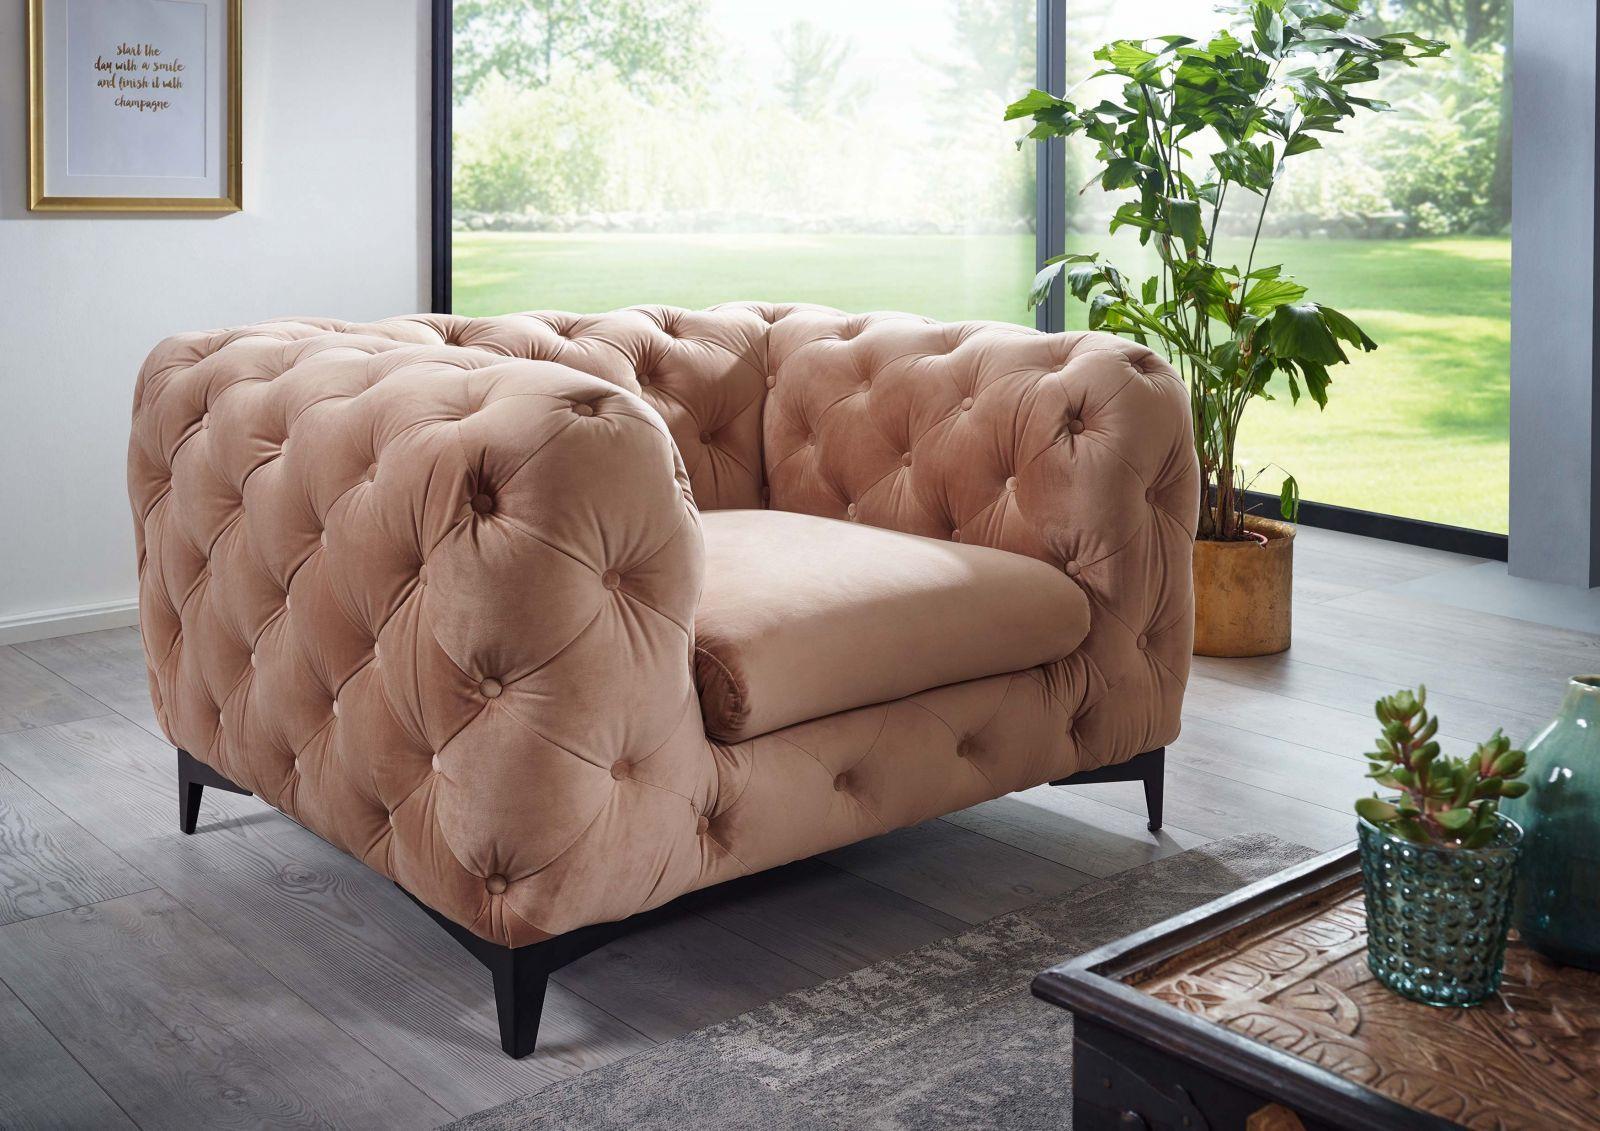 Relaxsessel Günstig Leder Sessel Bezug Ohrensessel Barock Sofa Günstig Kaufen Ledersessel Klein Kaufen Ohrens Günstige Sofas Sessel Sofa Günstig Kaufen